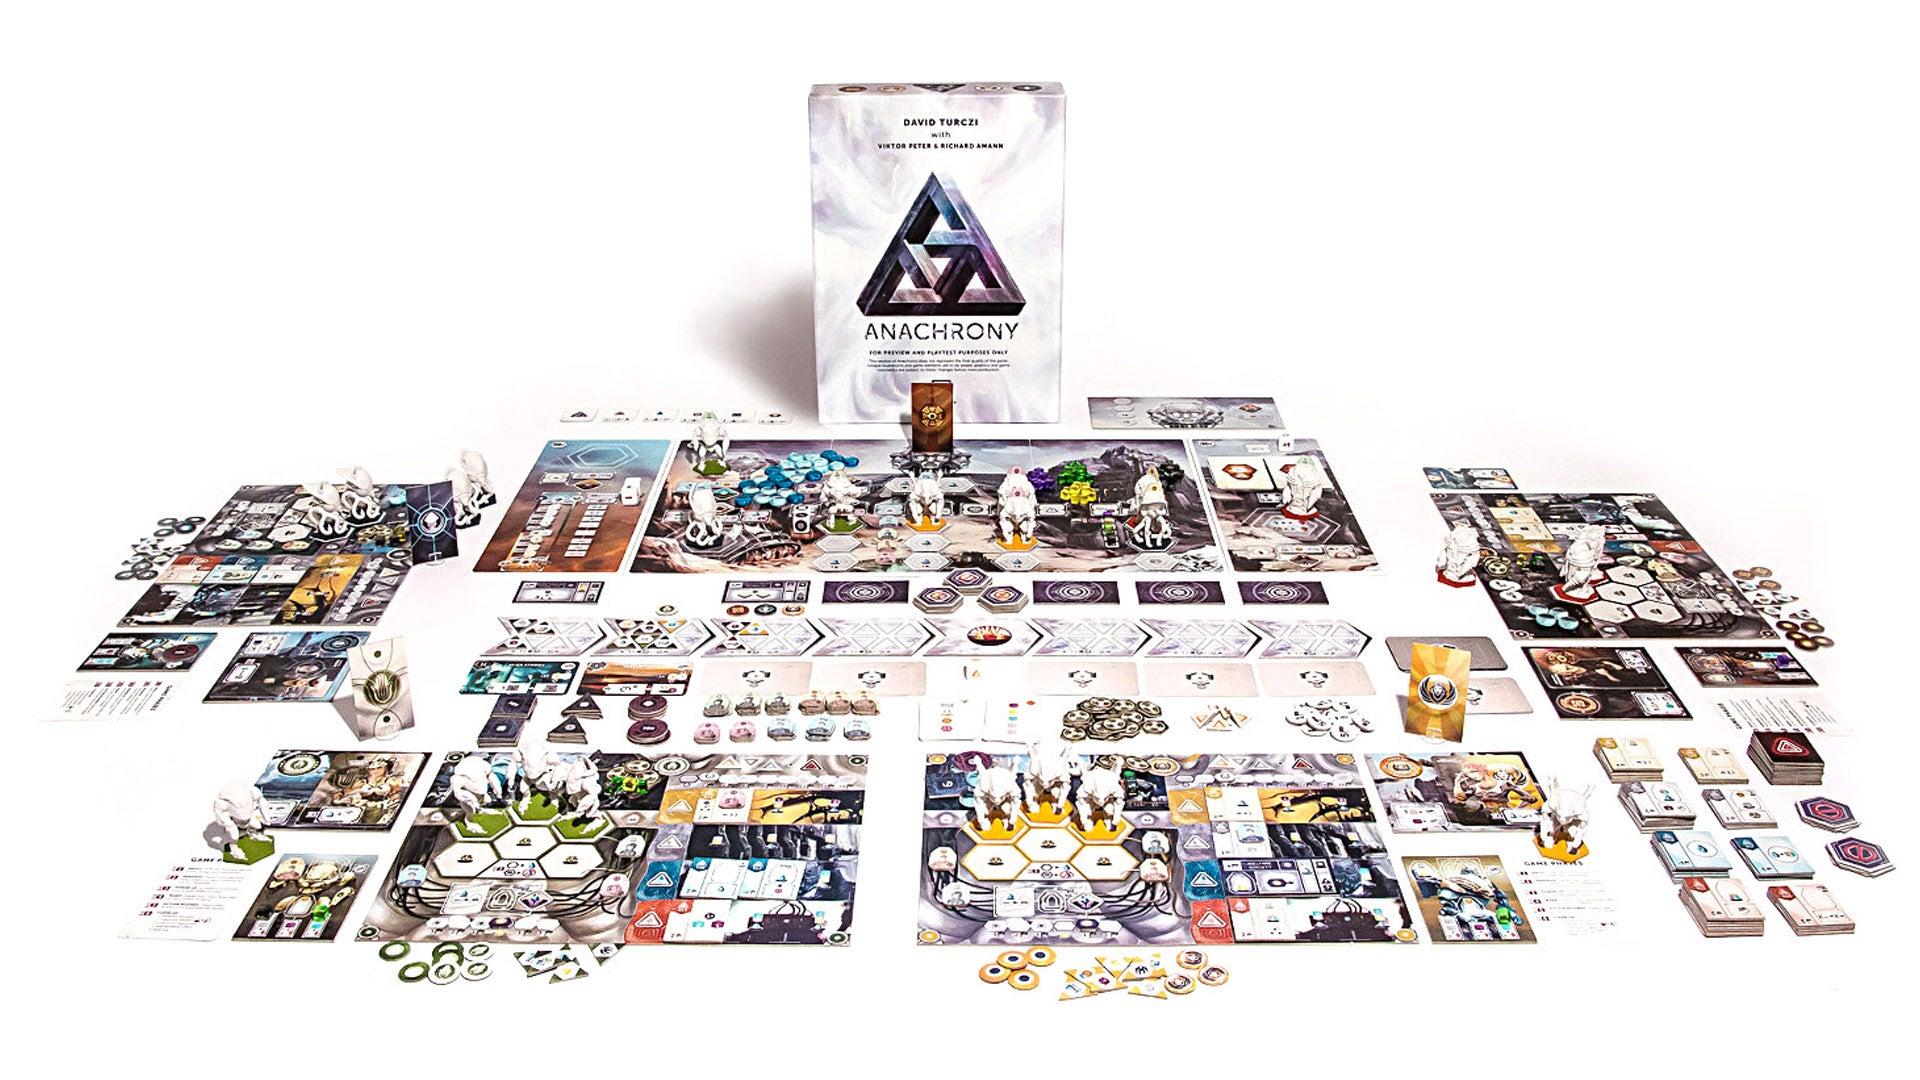 anachrony-board-game-layout.jpg